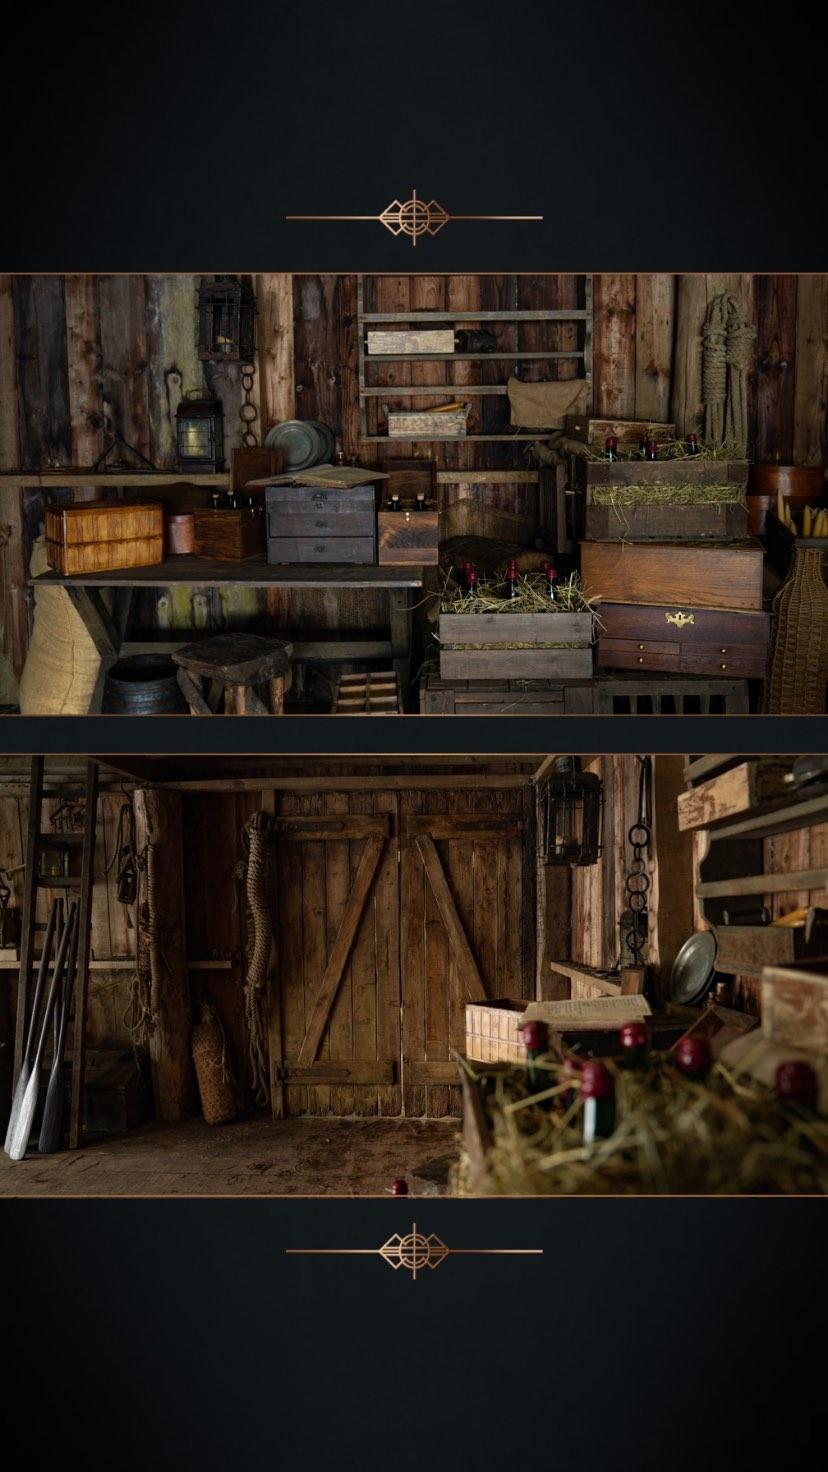 ANECDOTE COULISSE episode 10 saison 5 Outlander